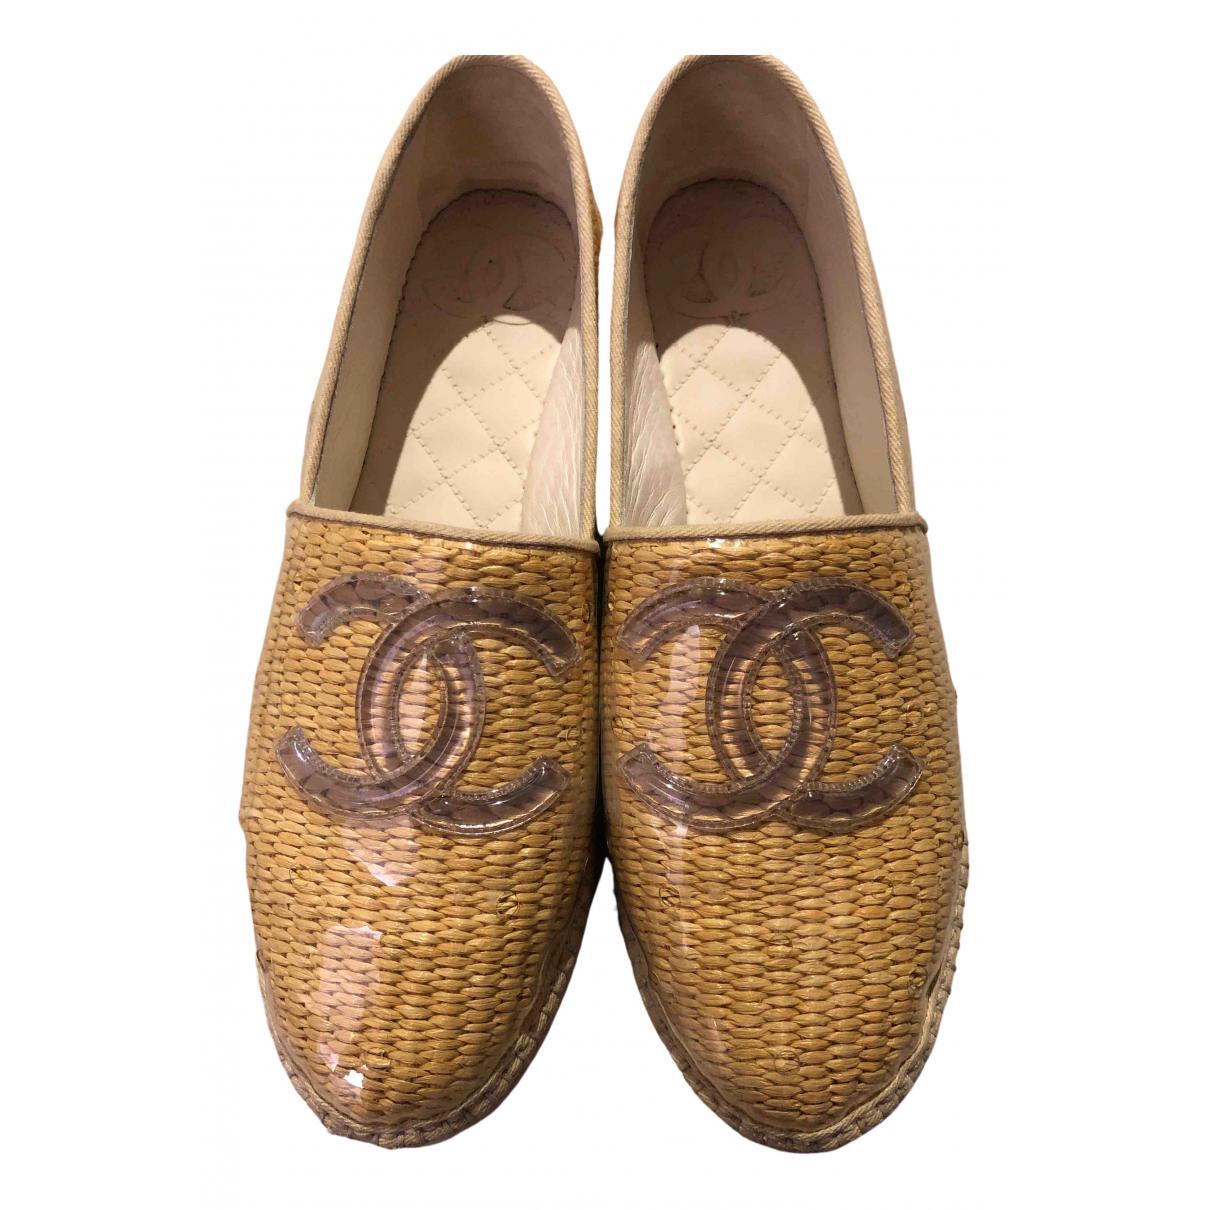 Chanel \N Espadrilles in  Braun Polyester